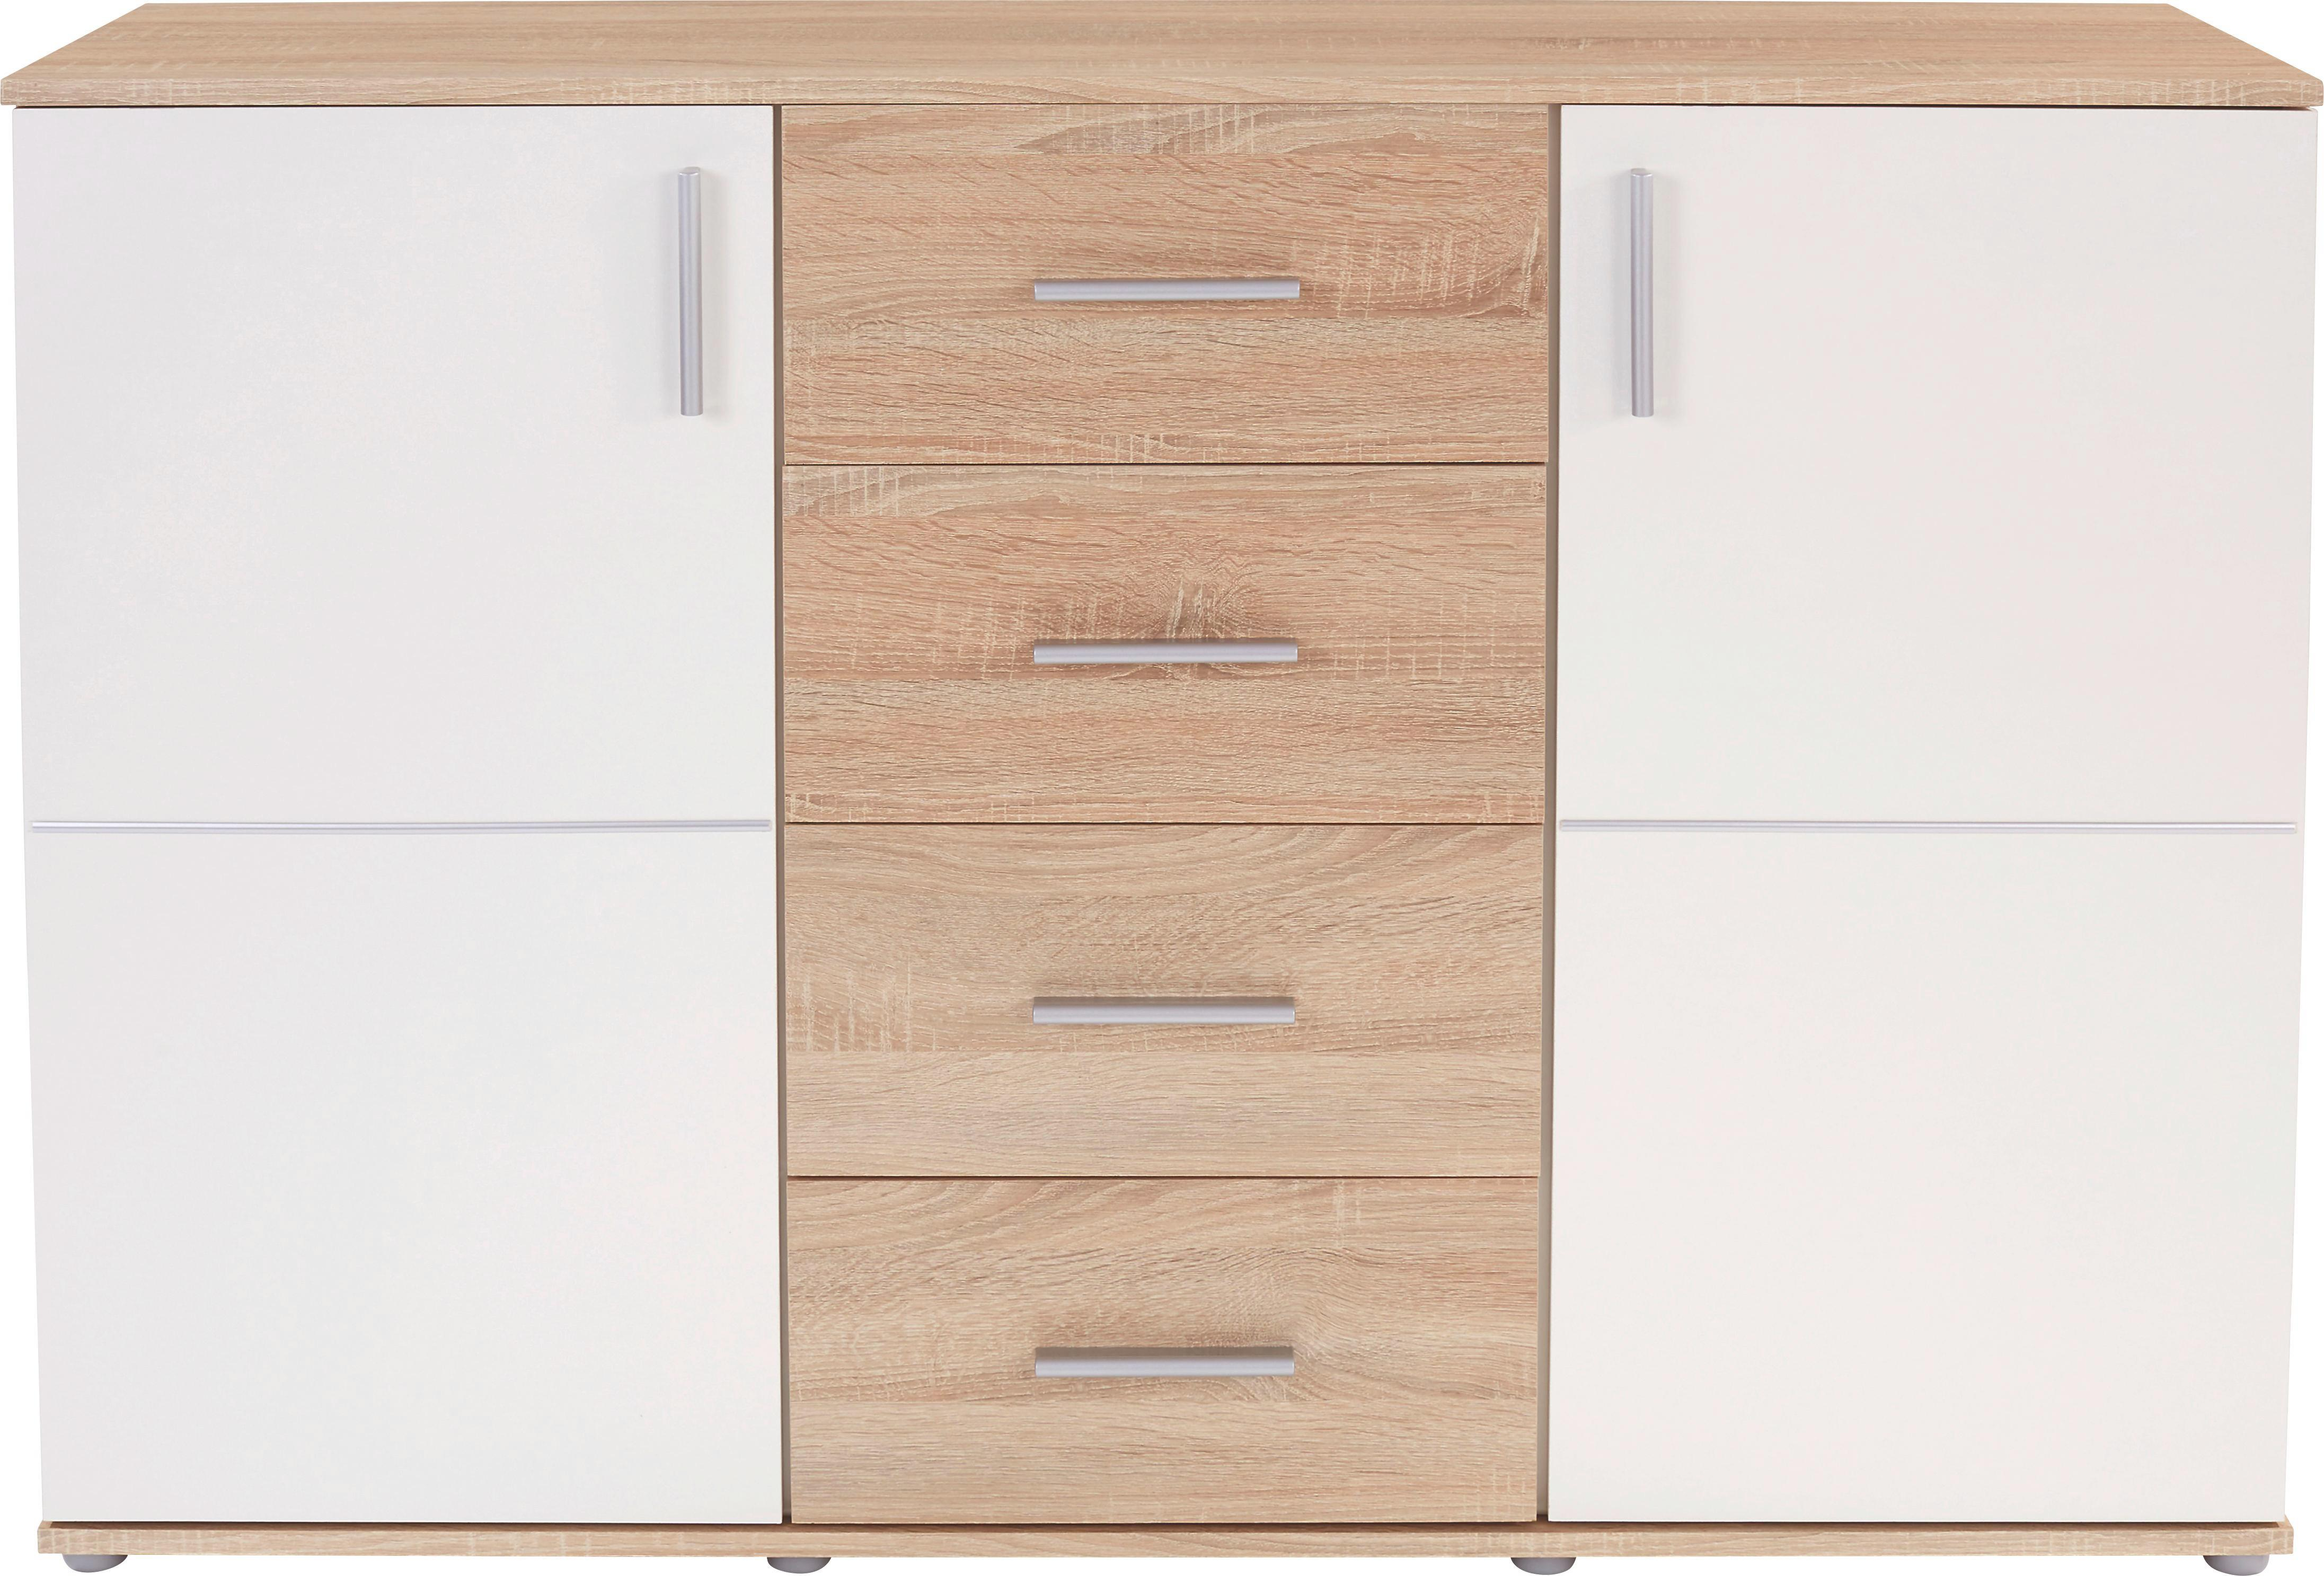 Komód Ina - Sonoma tölgy/fehér, modern, faanyagok (132,2/95,1/38,6cm)